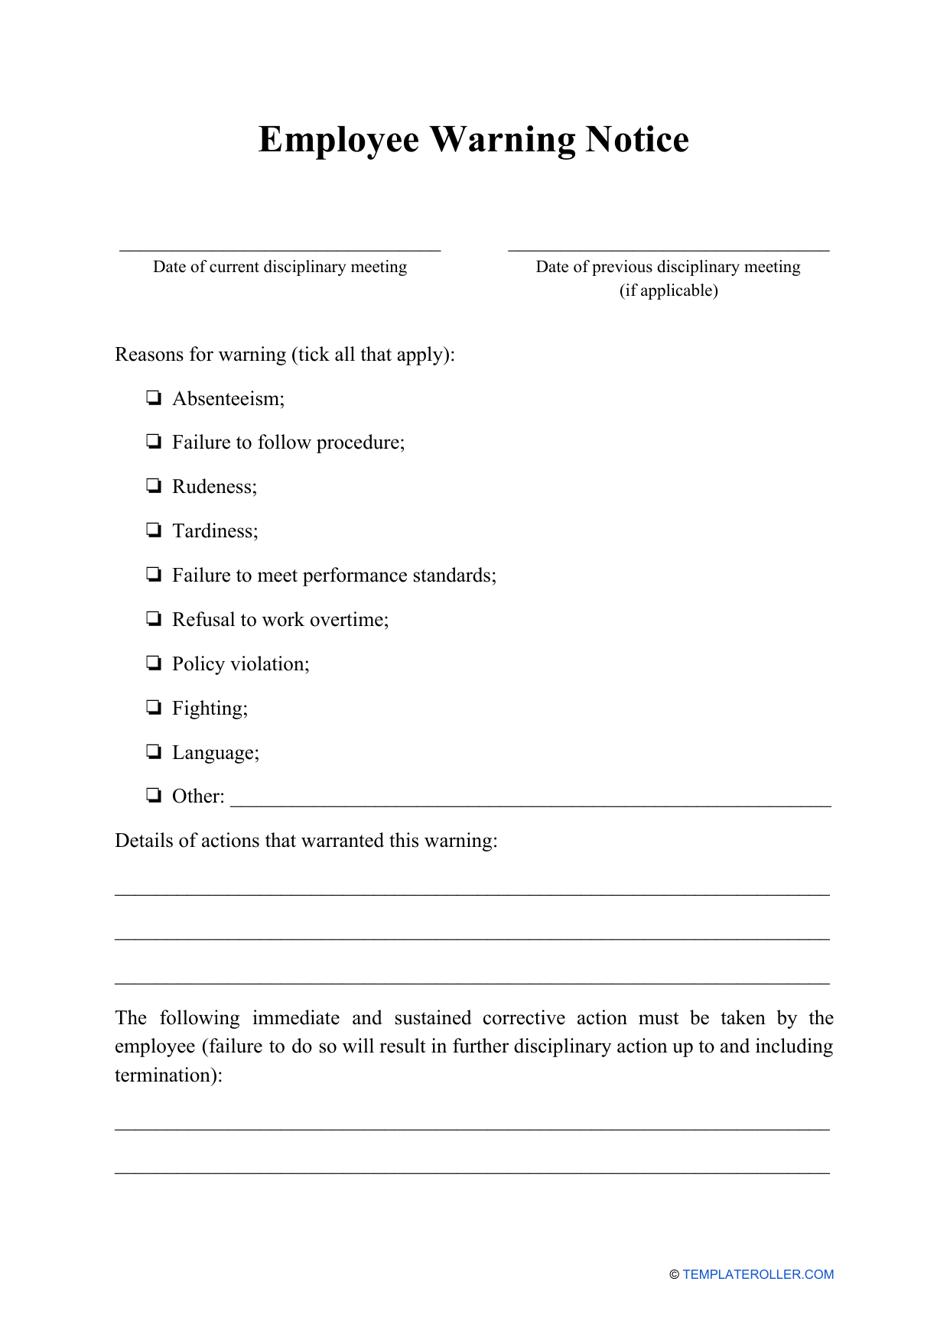 Employee Warning Notice Template Download Printable PDF ...